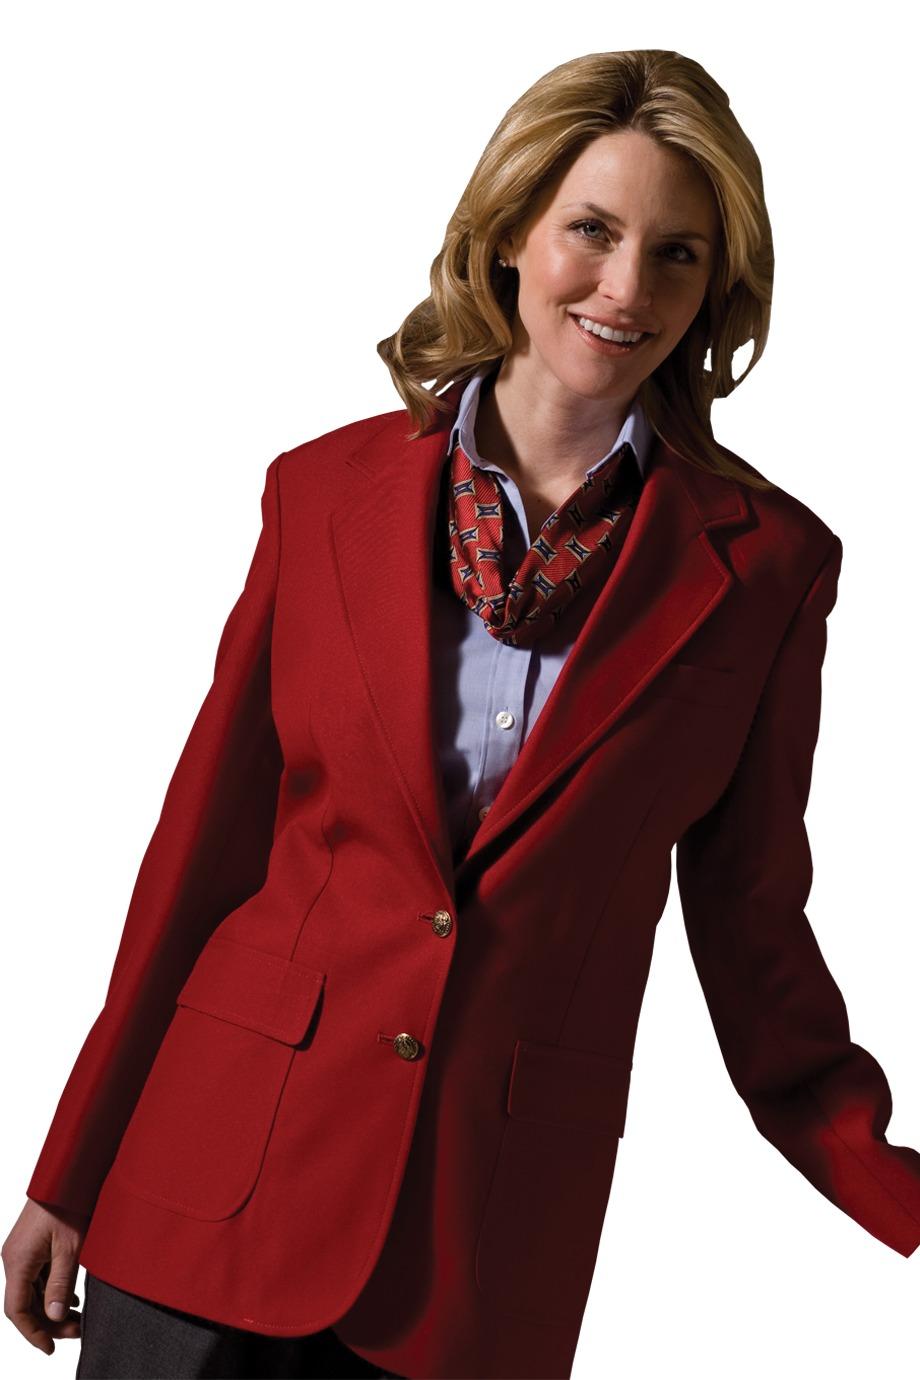 Edwards Garment 6500 - Women's Polyester Blazer